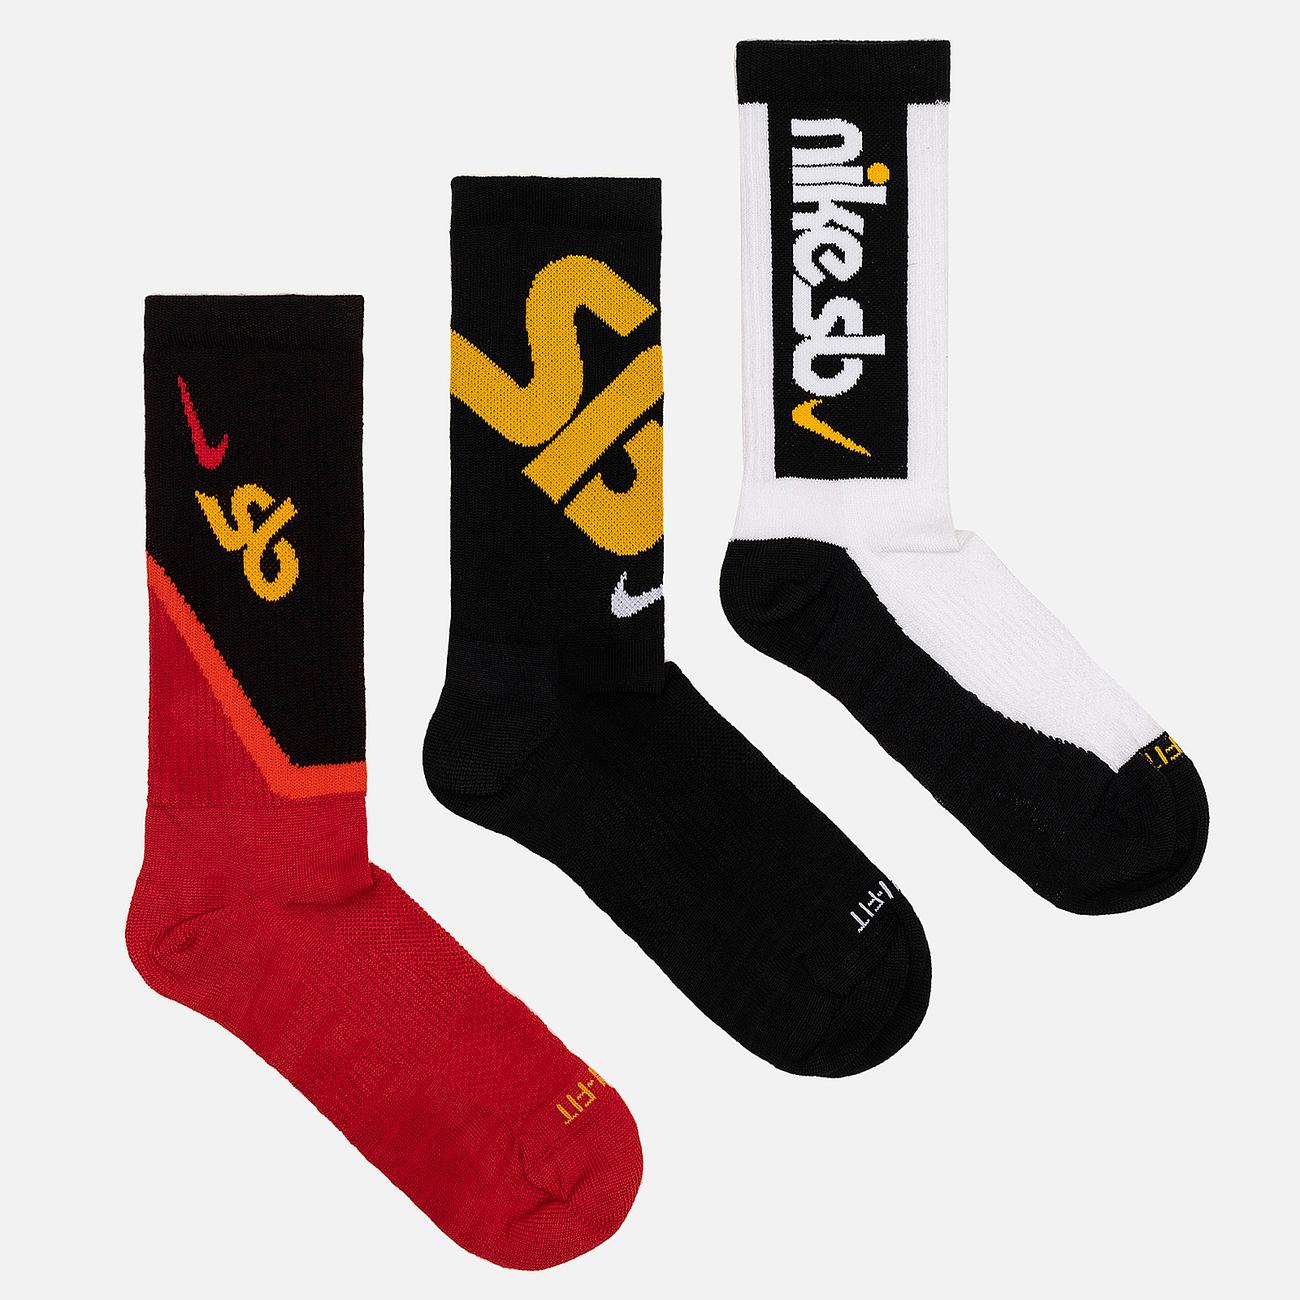 Комплект носков Nike SB 3-Pack Everyday Max Lightweight Crew Multi-Color